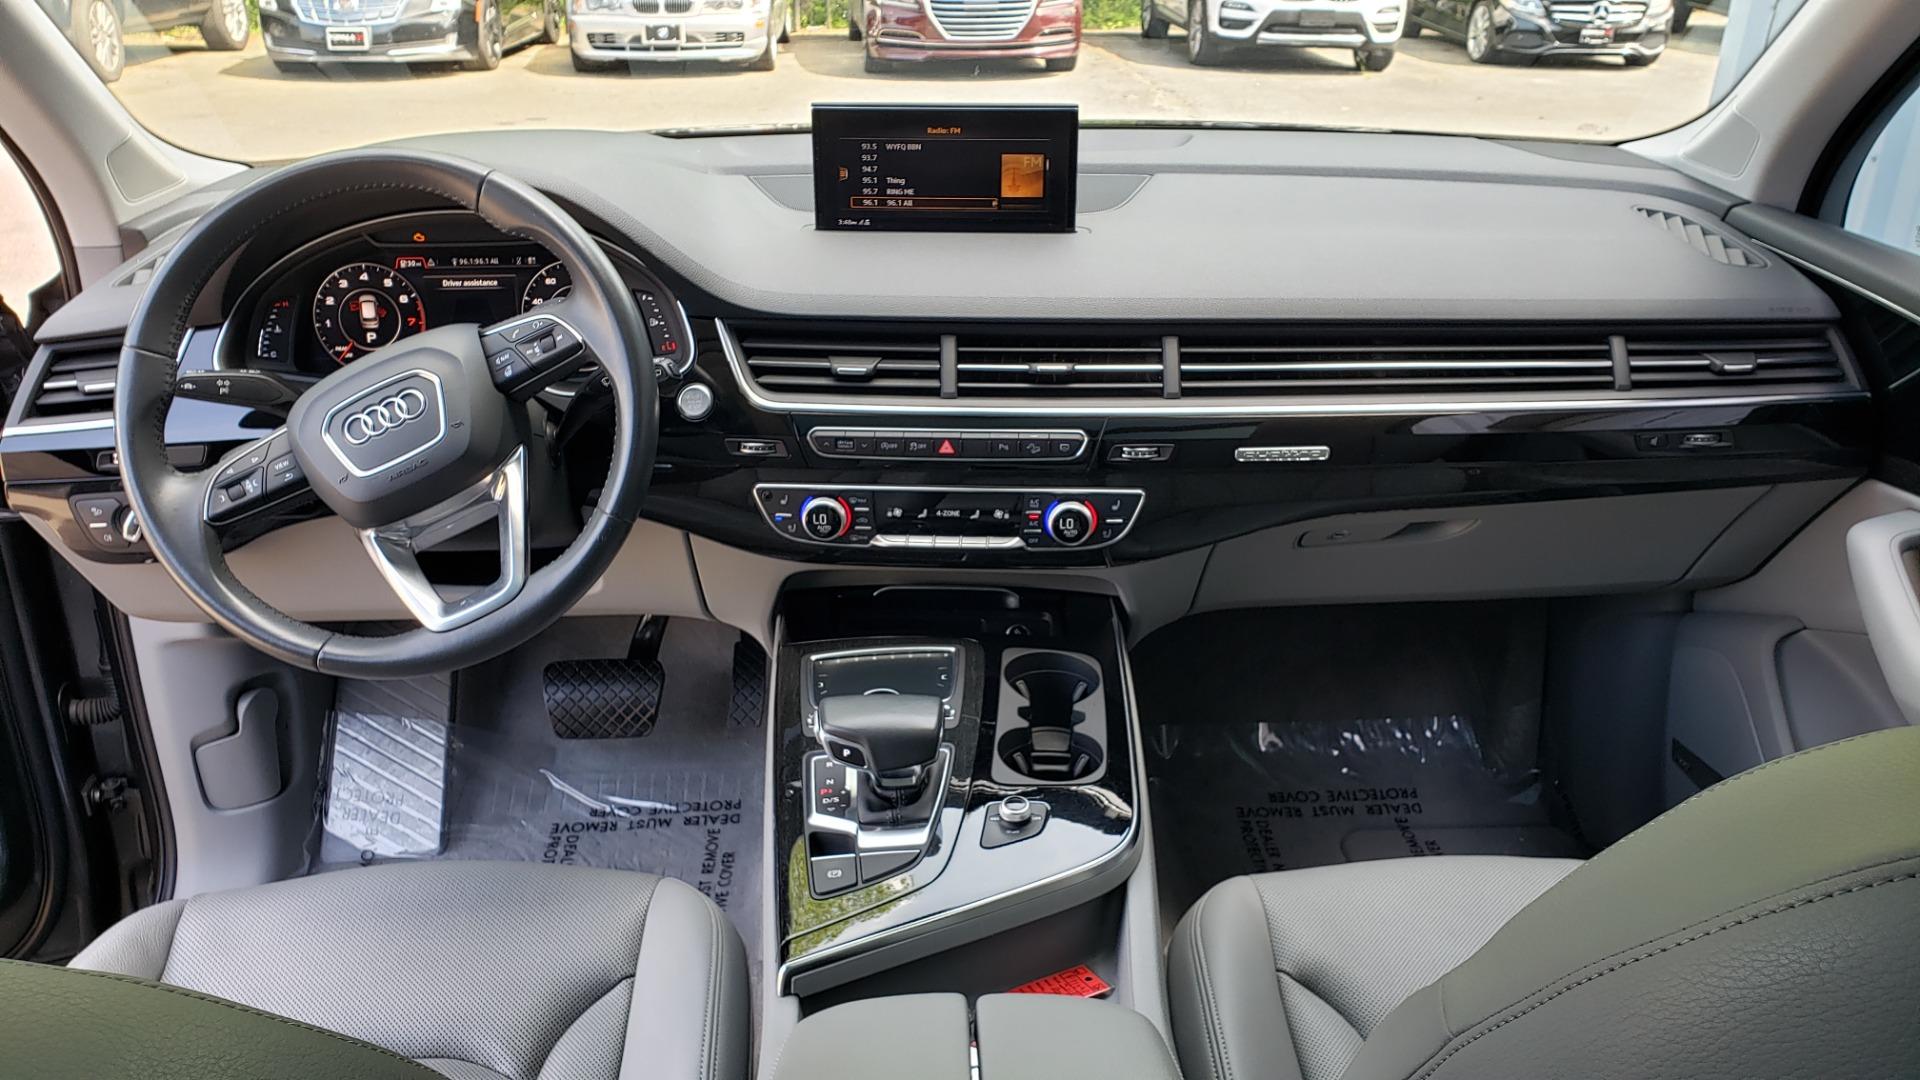 Used 2018 Audi Q7 PRESTIGE TIPTRONIC / NAV / SUNROOF / ADAPTIVE PKG / DRVR ASST / CLD WTHR /  for sale $49,995 at Formula Imports in Charlotte NC 28227 89